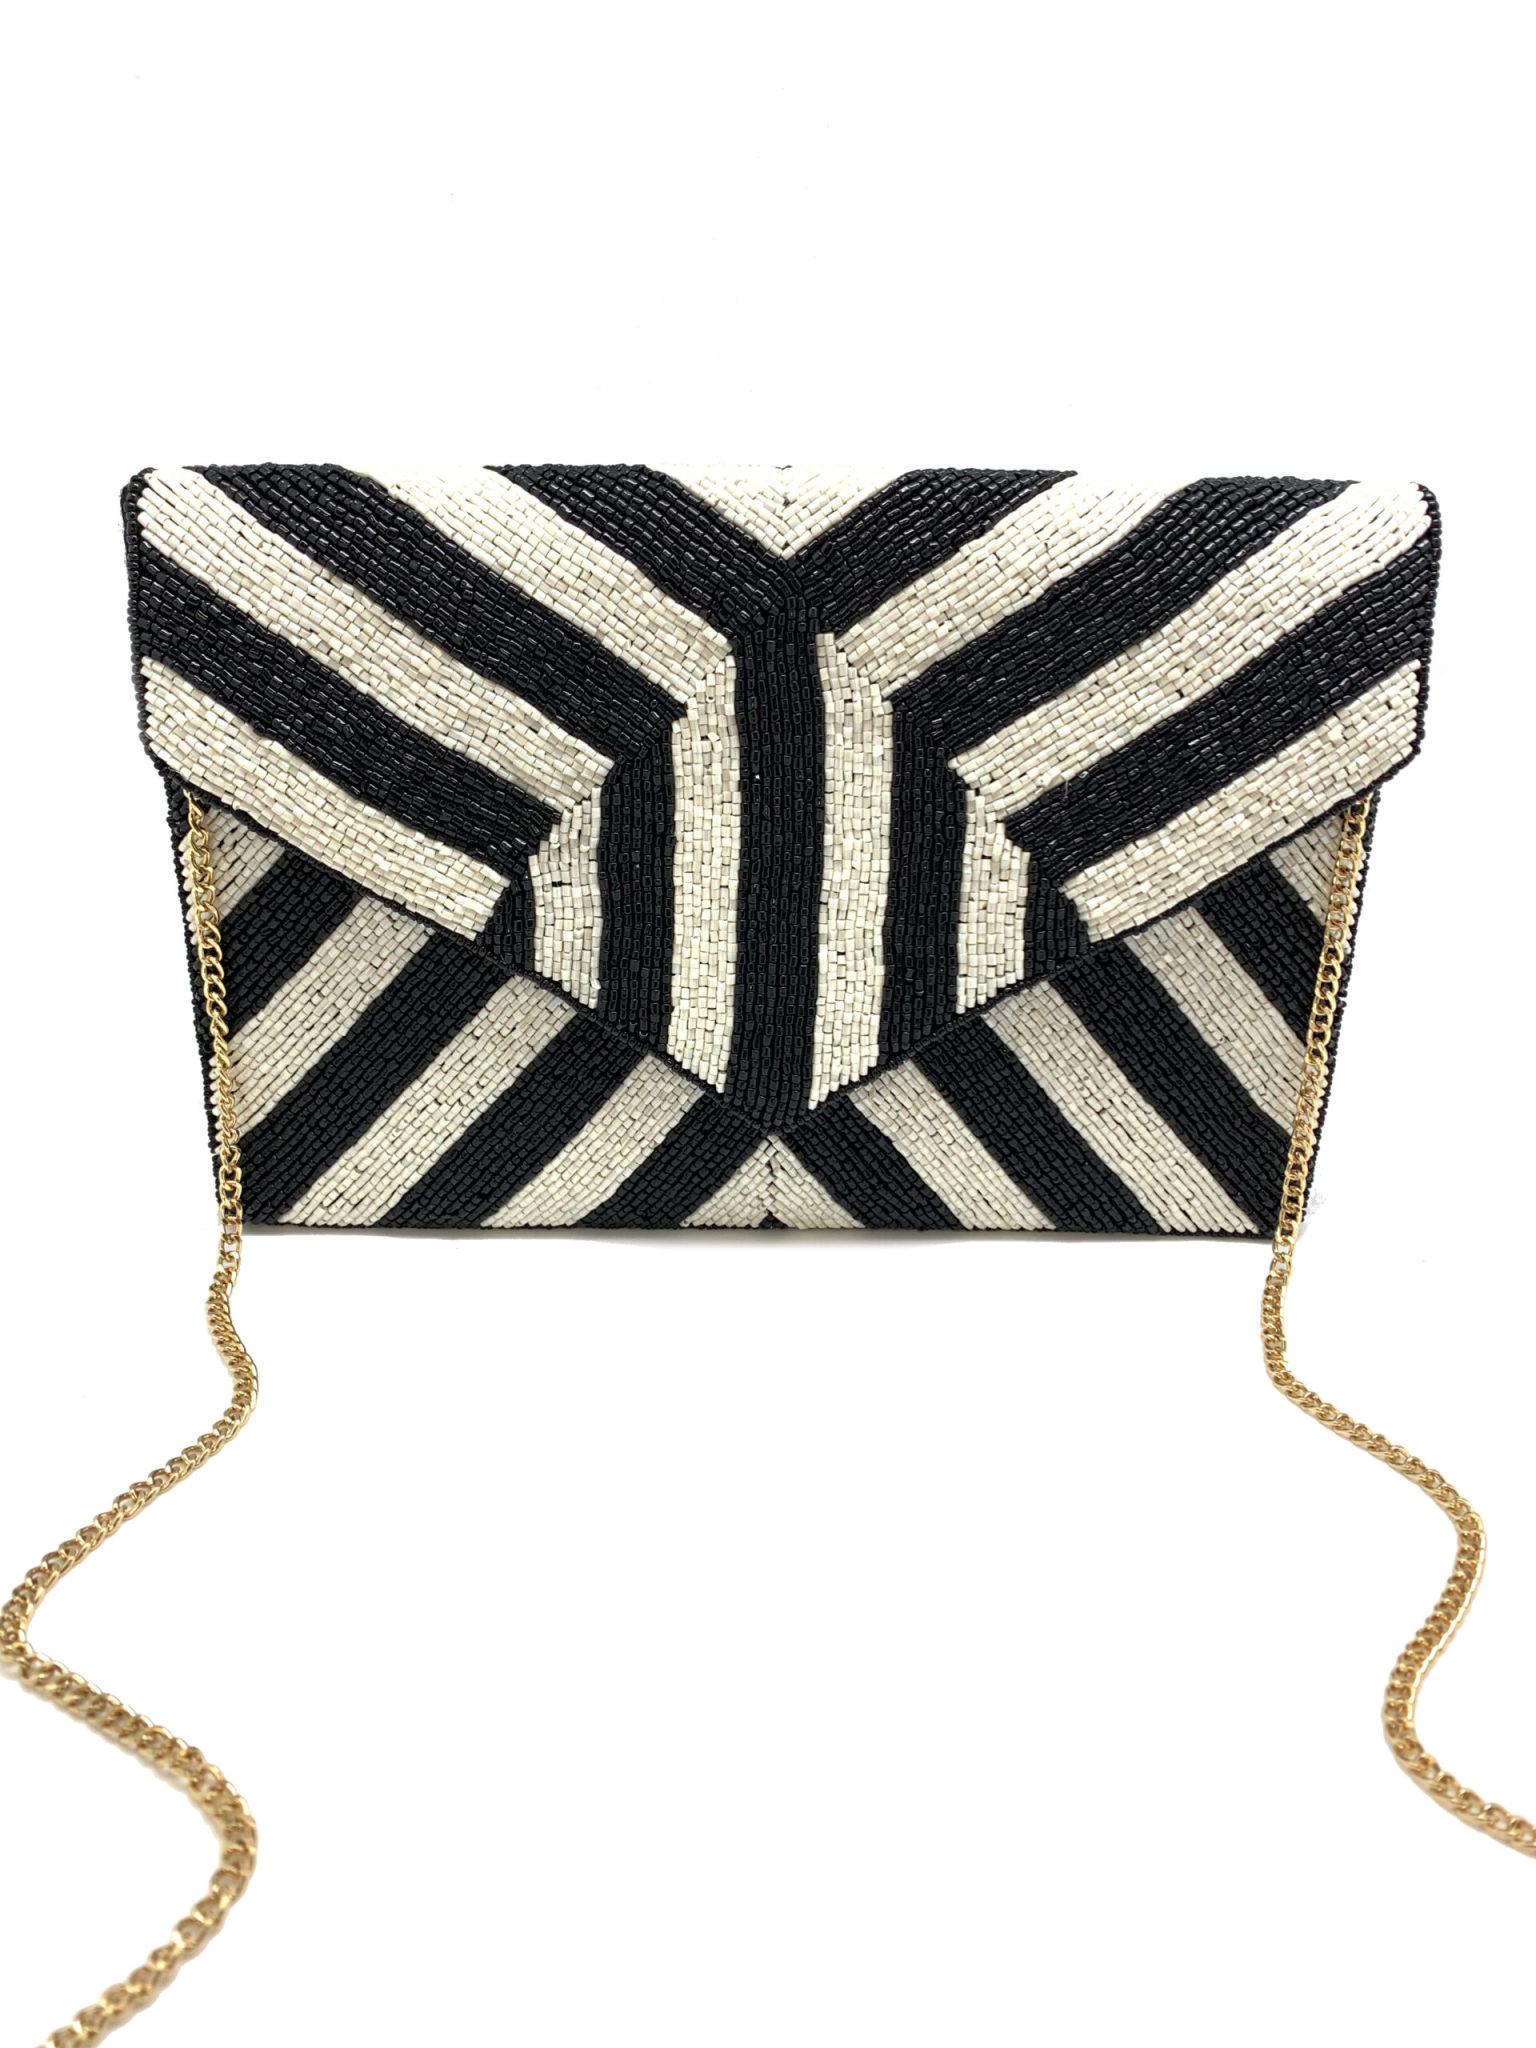 Beaded Clutch: Black & White Stripe